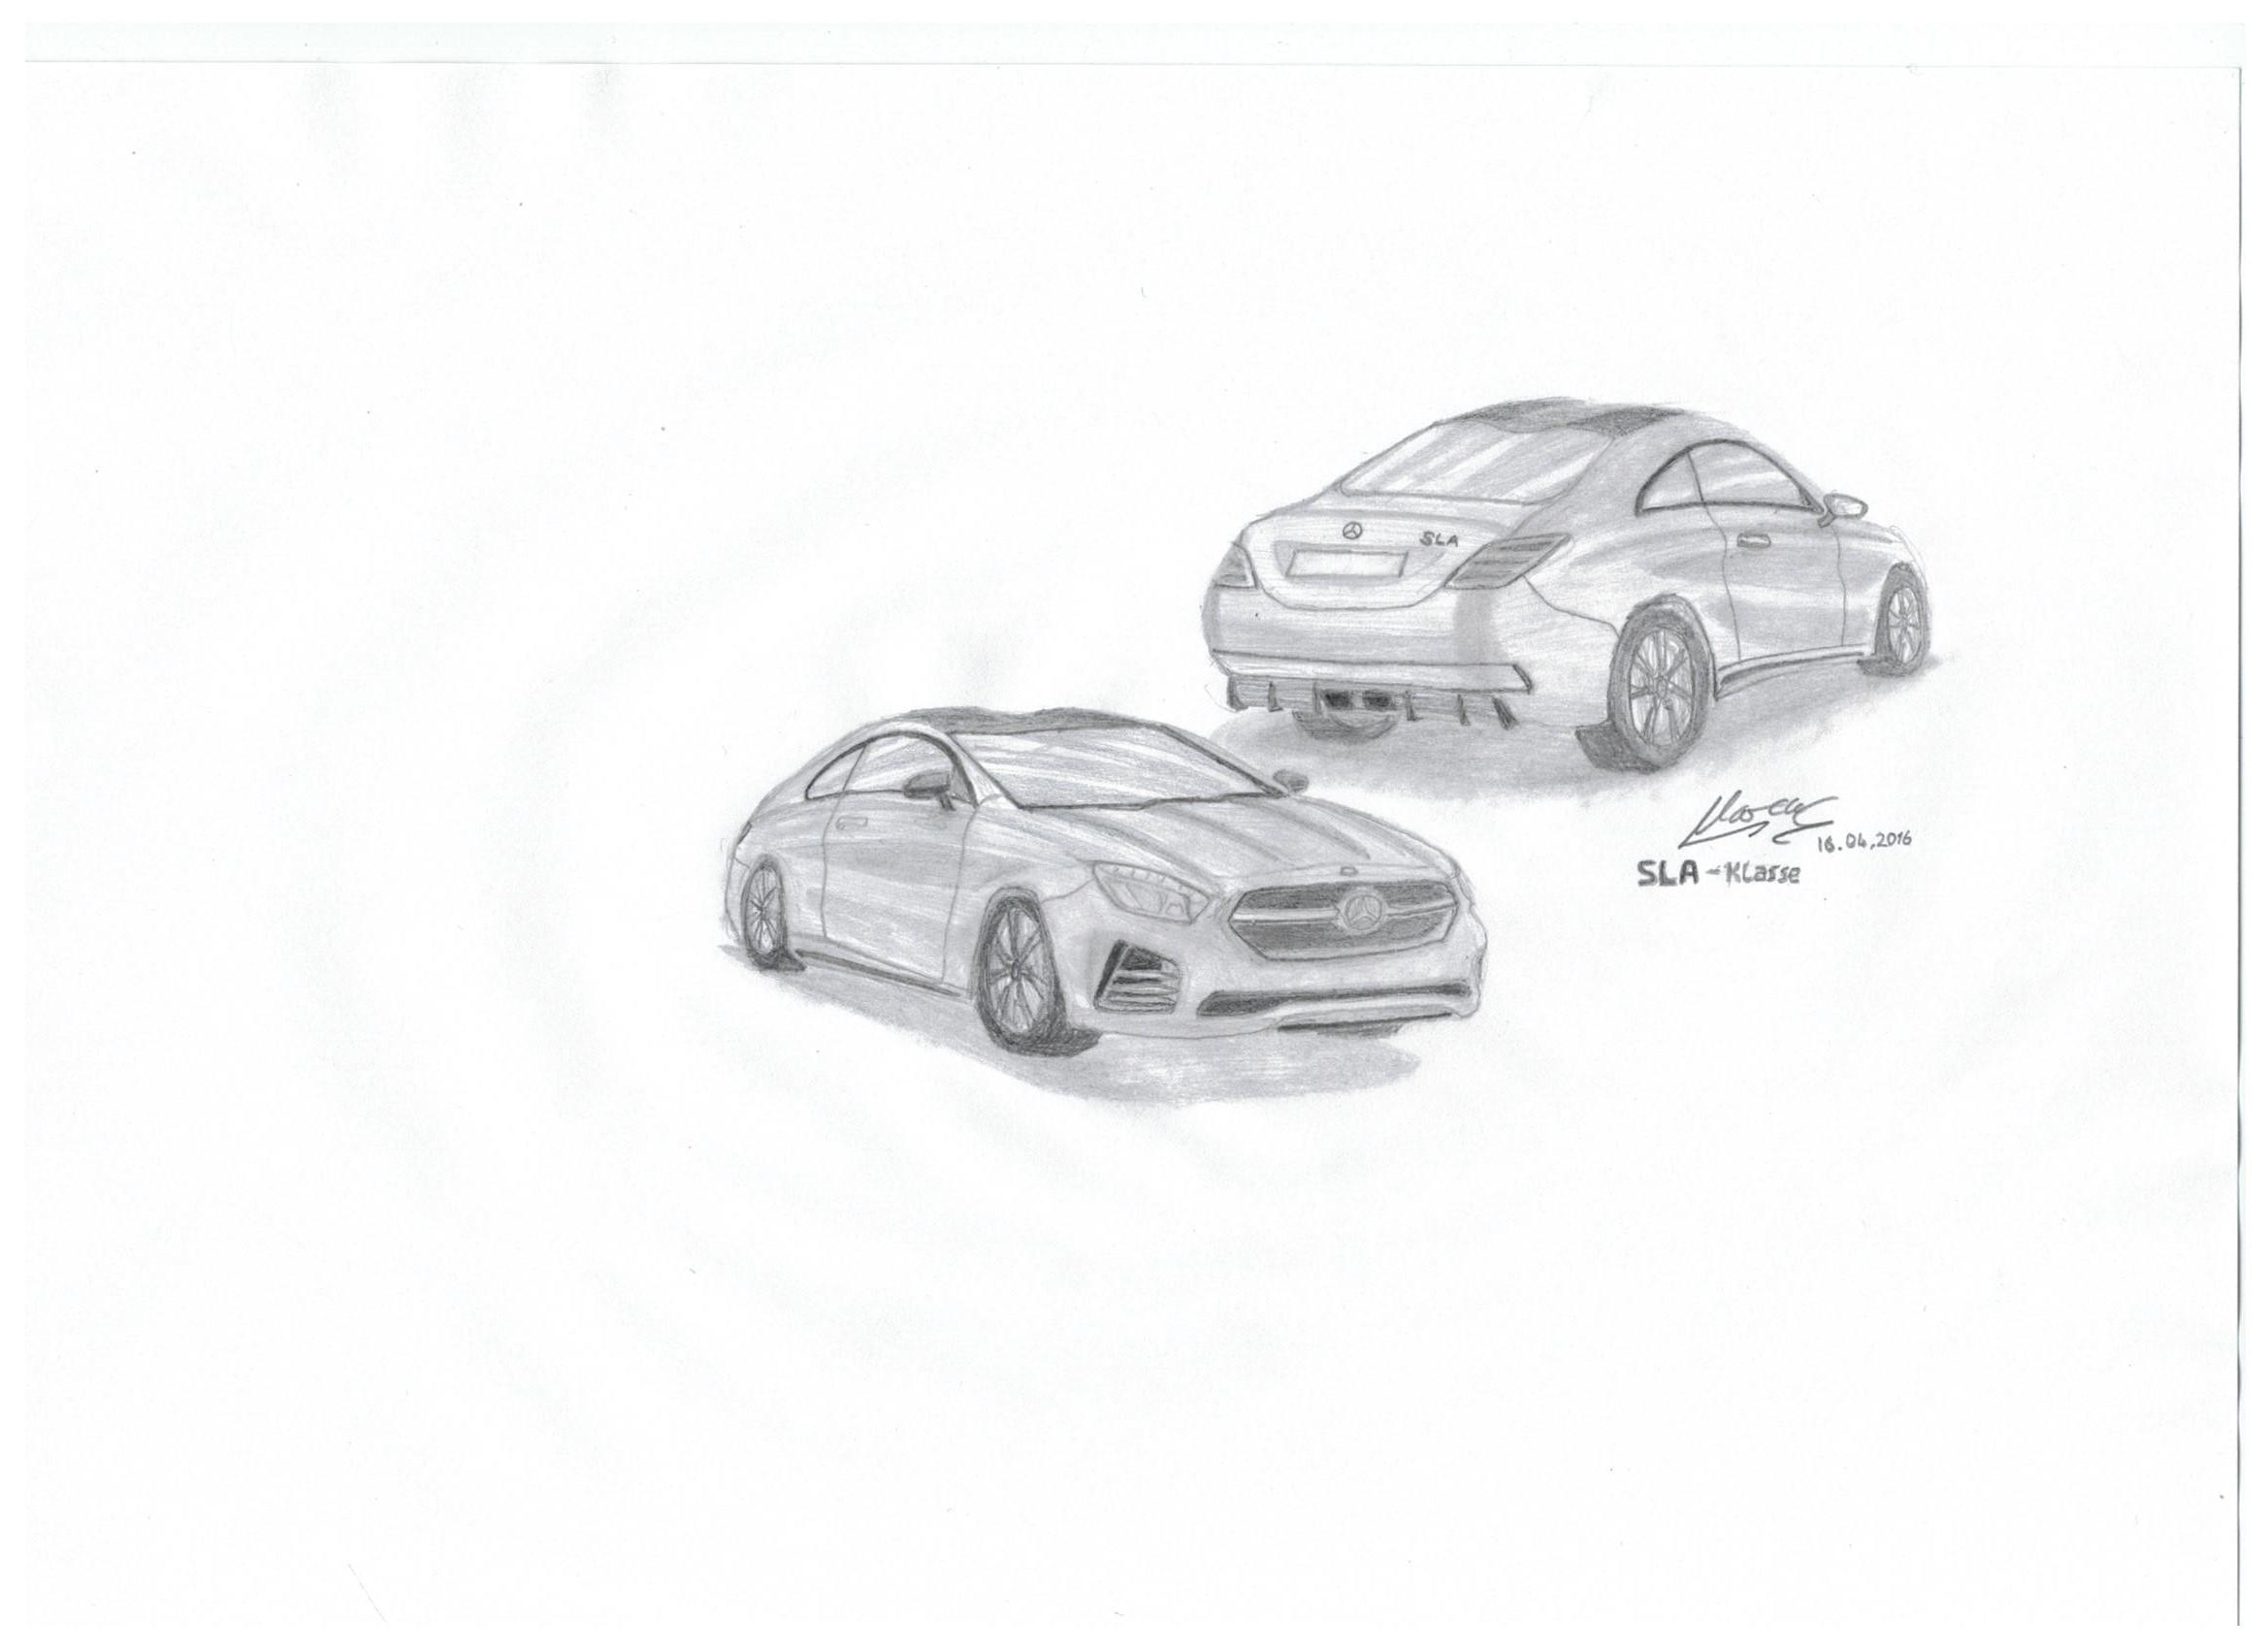 Mercedes benz sla eigenkreation by car4free on deviantart for Mercedes benz sla